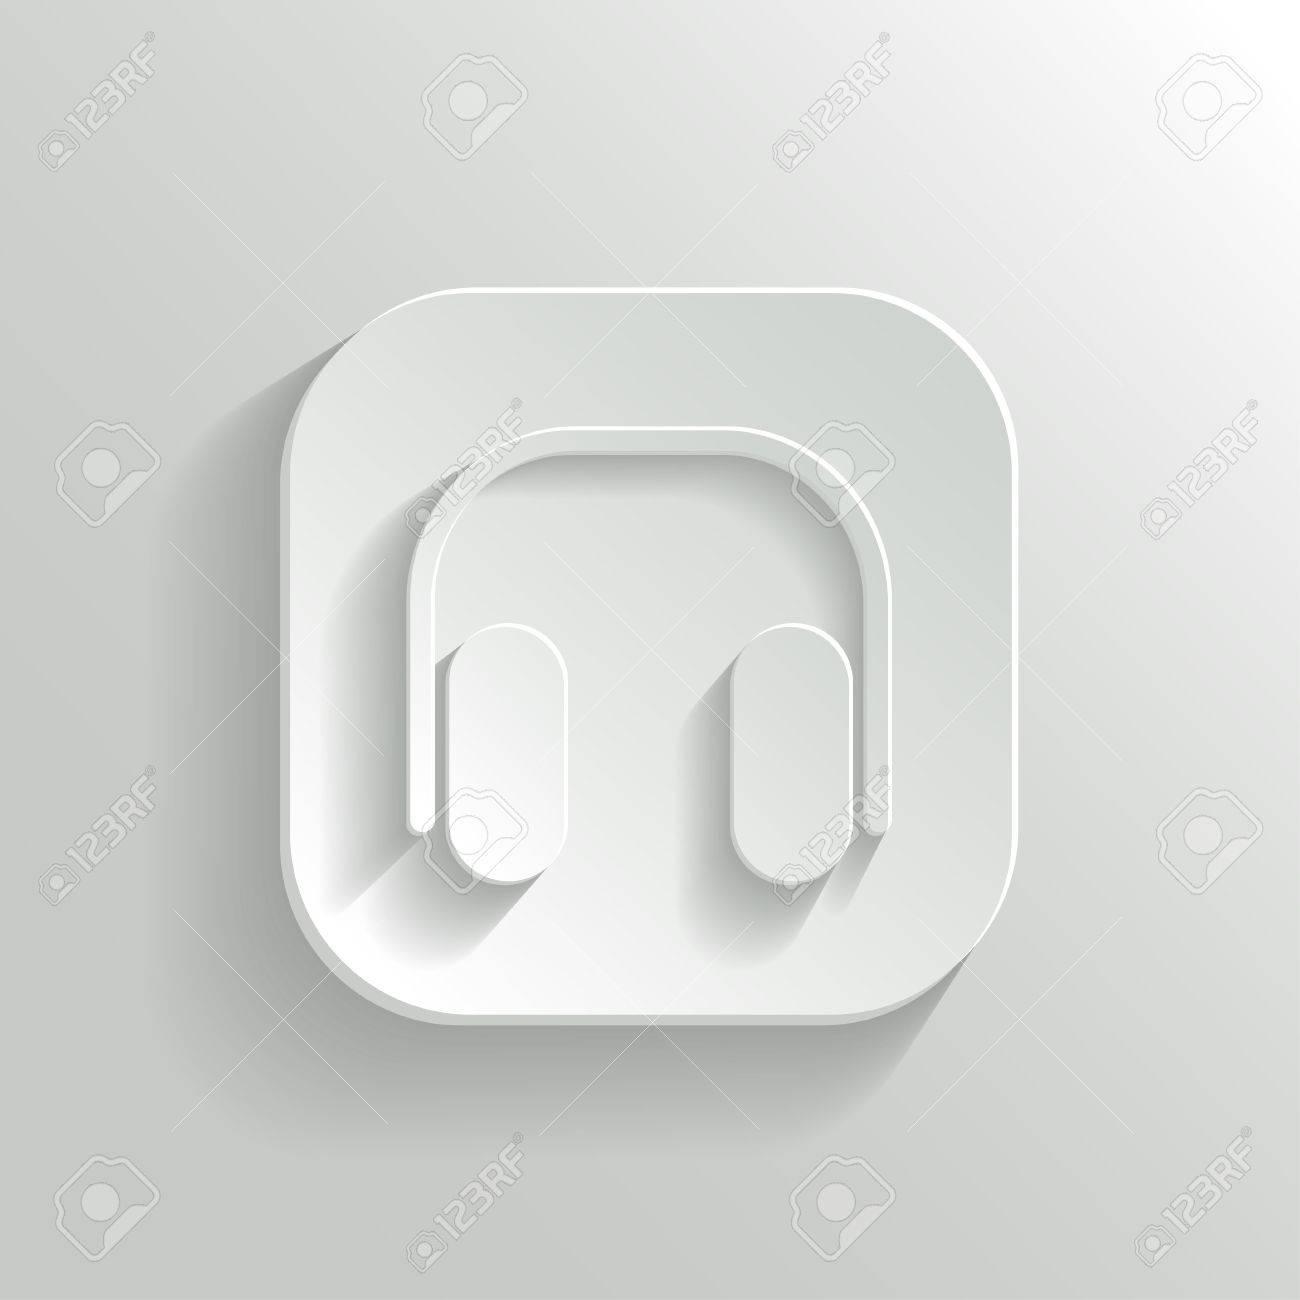 Headphones icon - vector white app button with shadow Stock Vector - 20989085